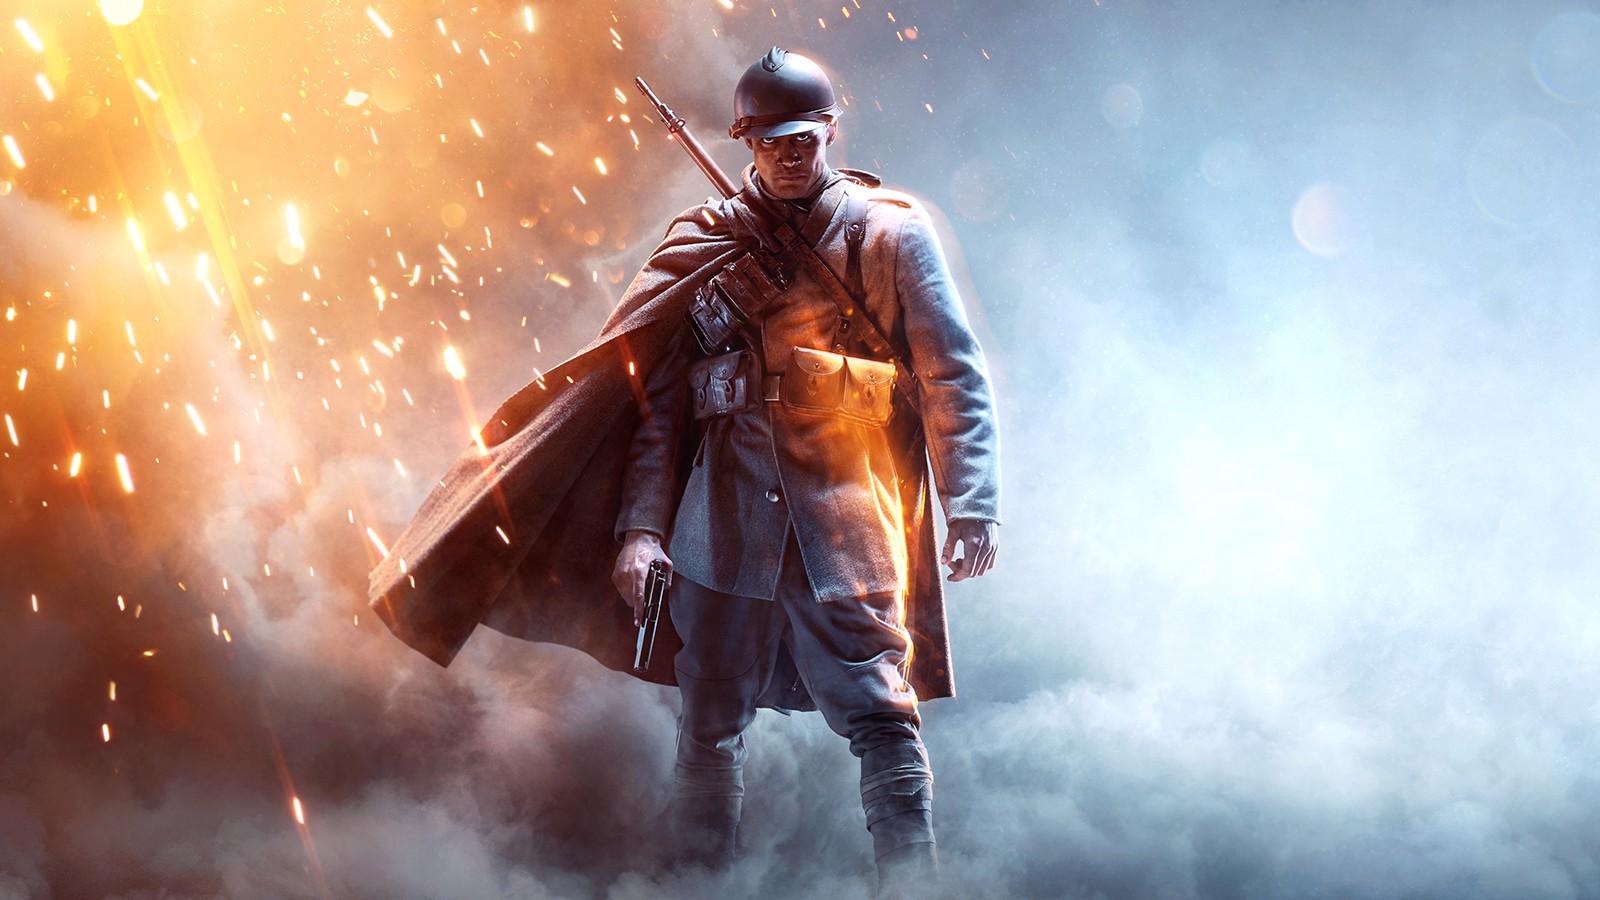 Battlefield 1 Wallpaper - Battlefield 1 Wallpaper Hd ...